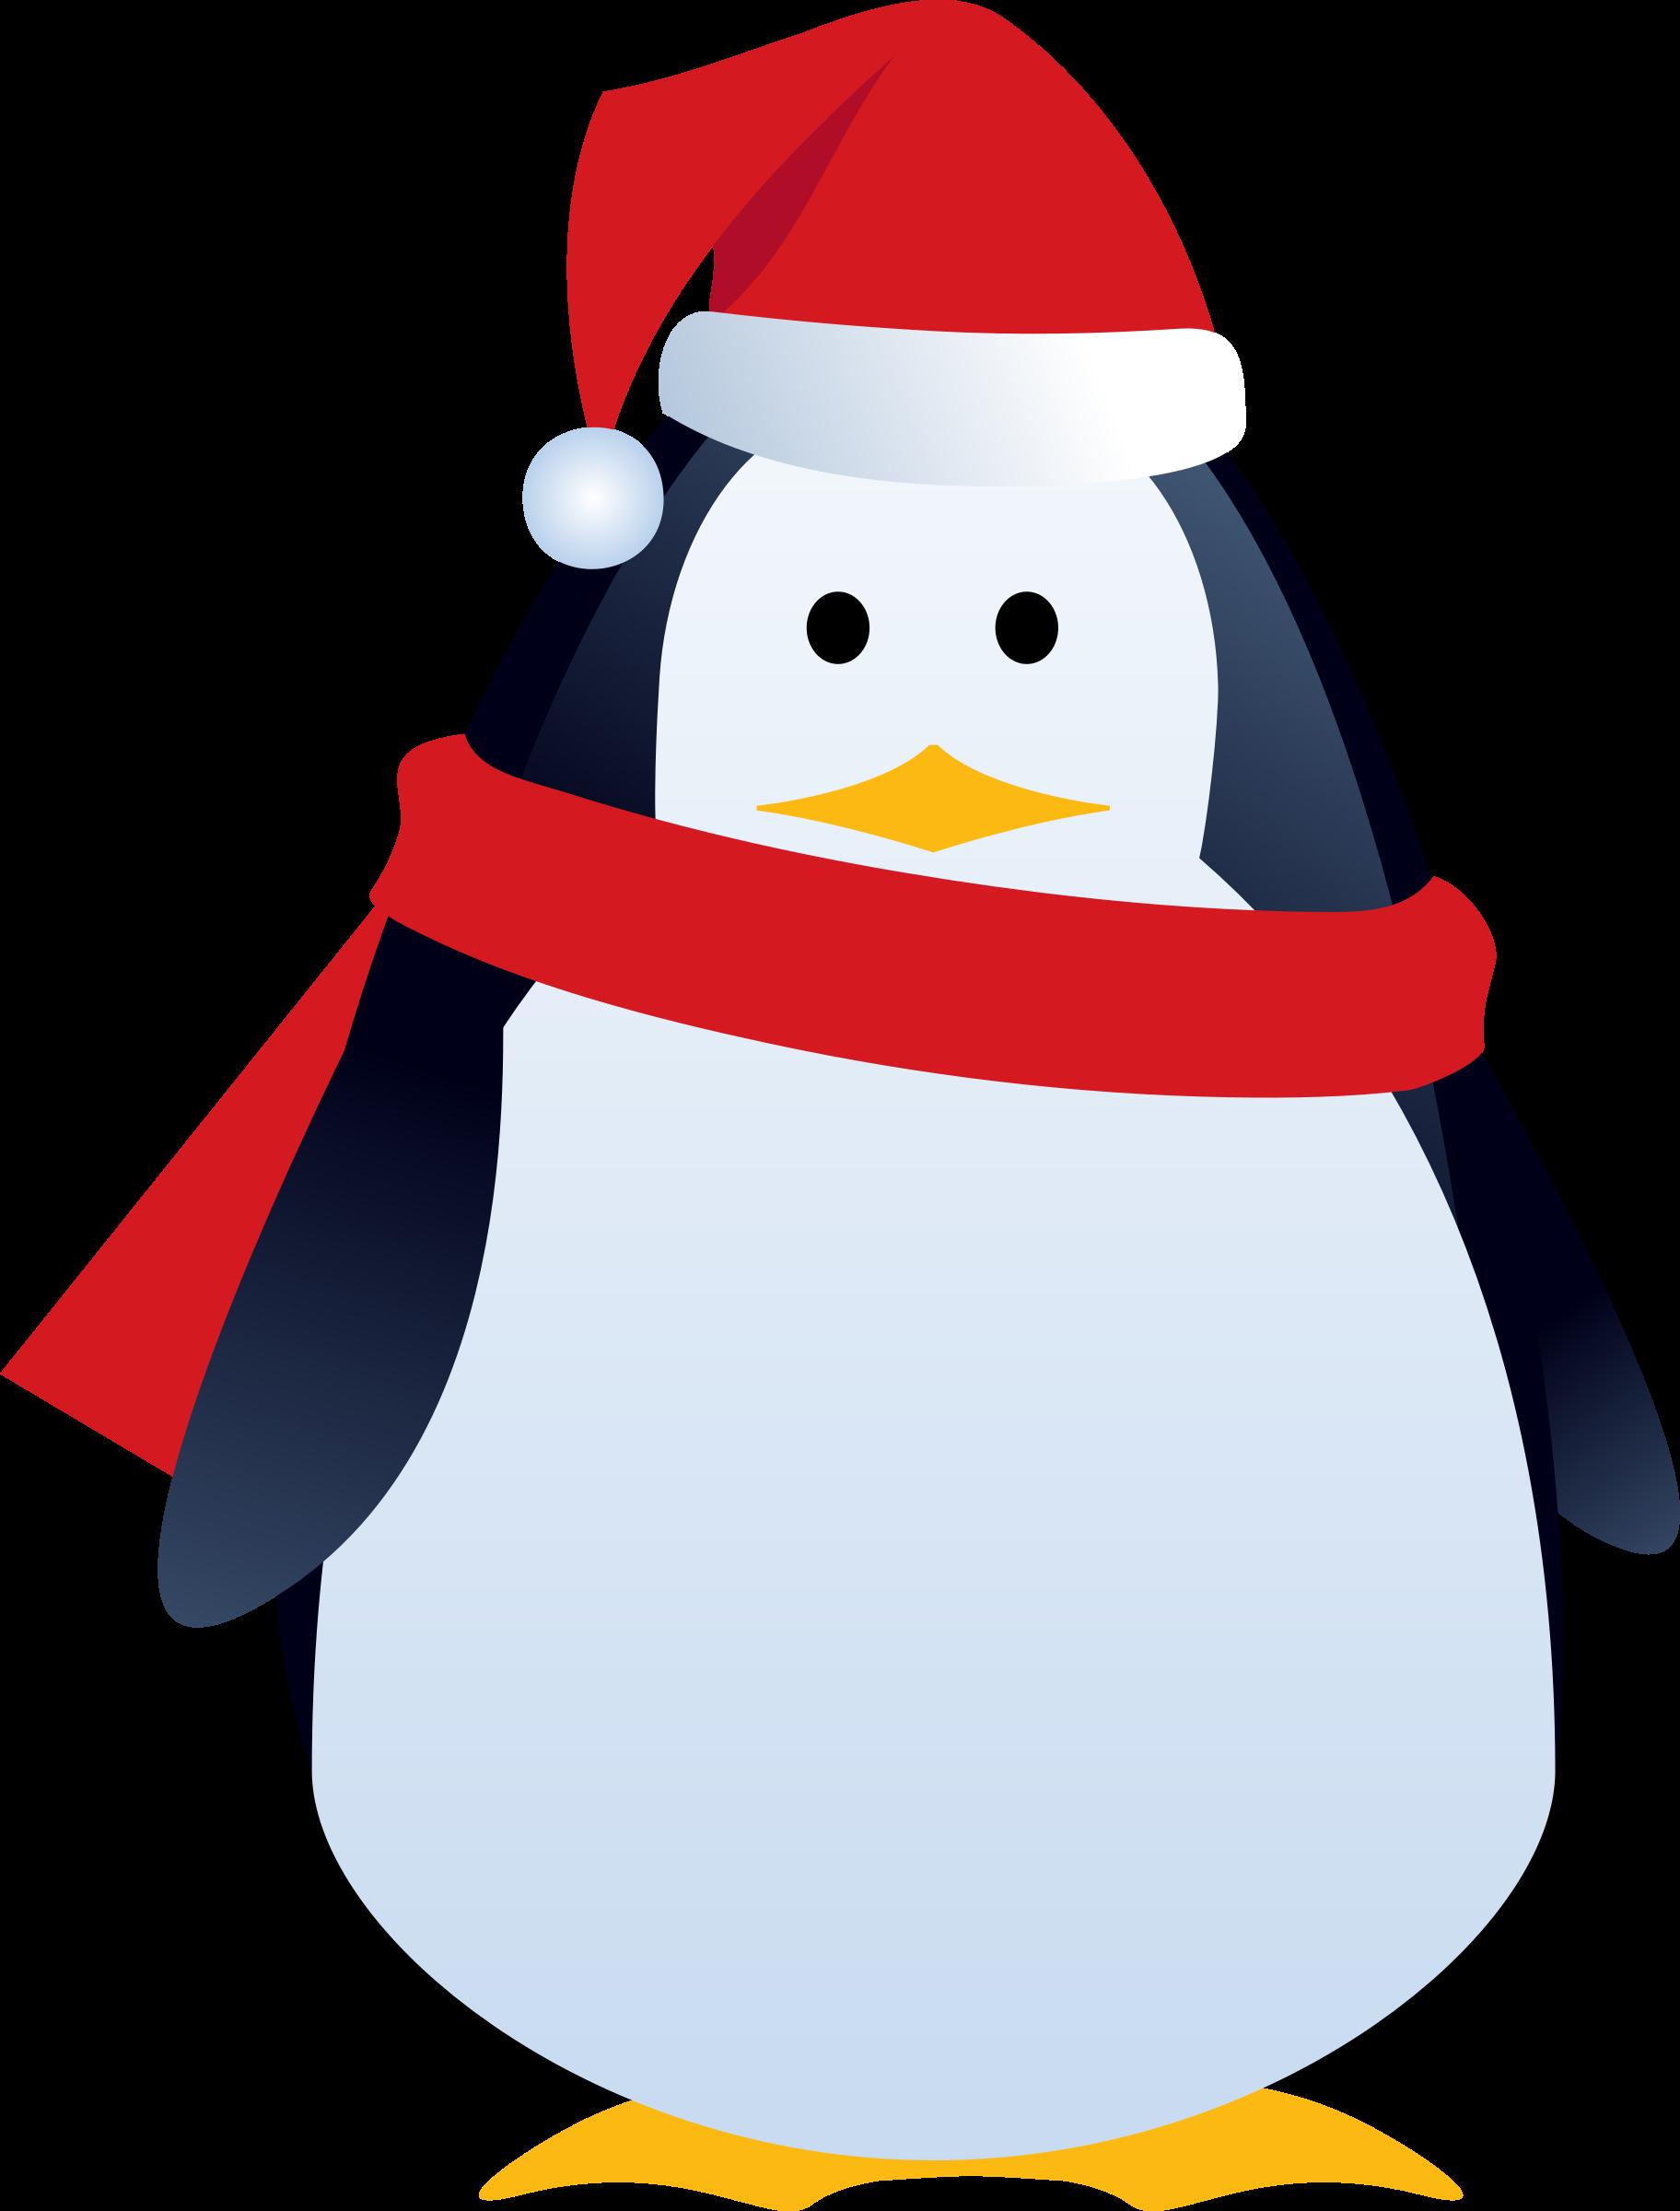 christmas penguin by LiesdeR